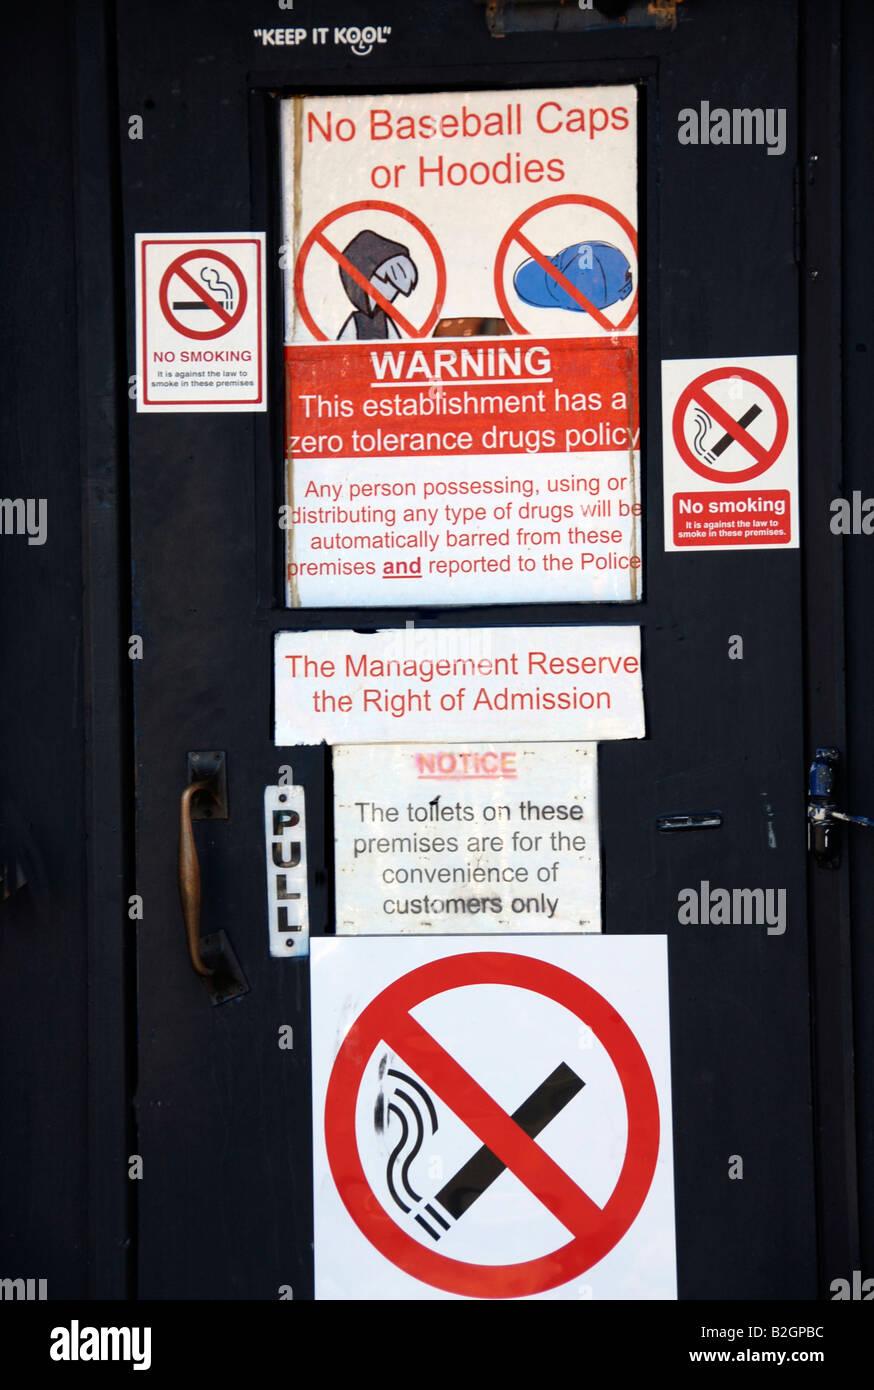 Warning sign on pub door anti hoodies  drugs  baseball caps. - Stock Image